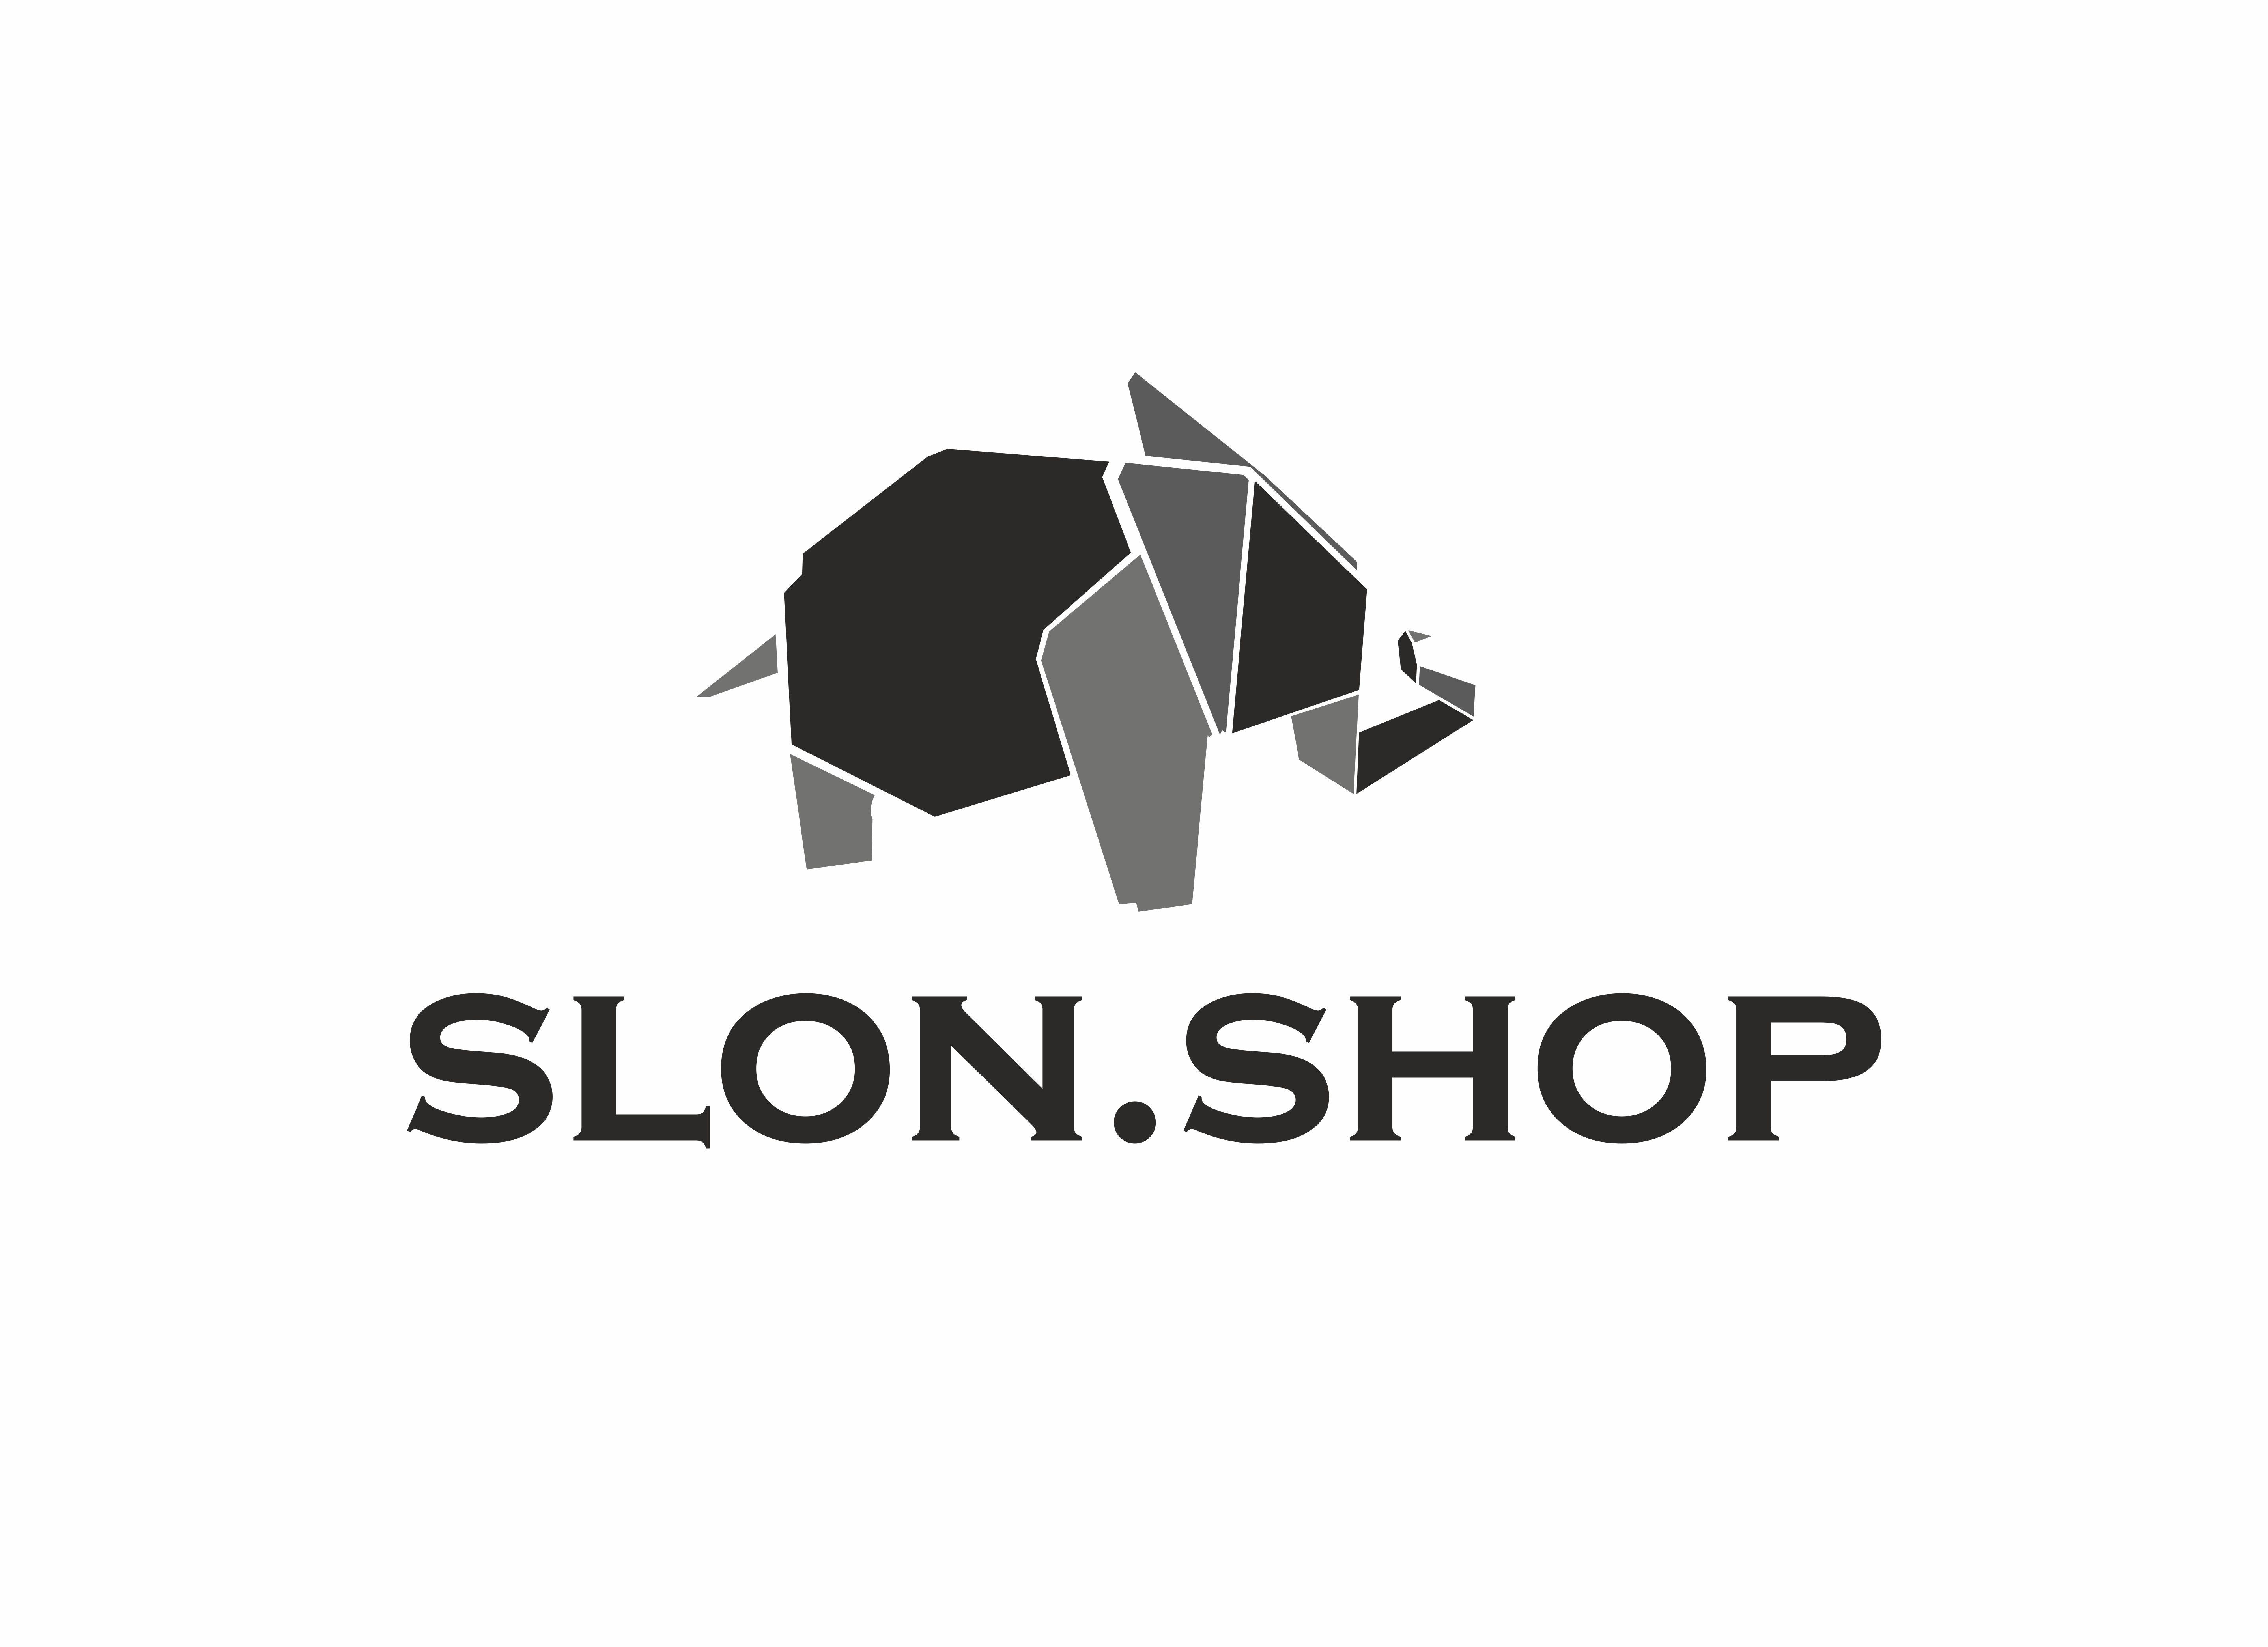 Разработать логотип и фирменный стиль интернет-магазина  фото f_491598d73db6659e.jpg